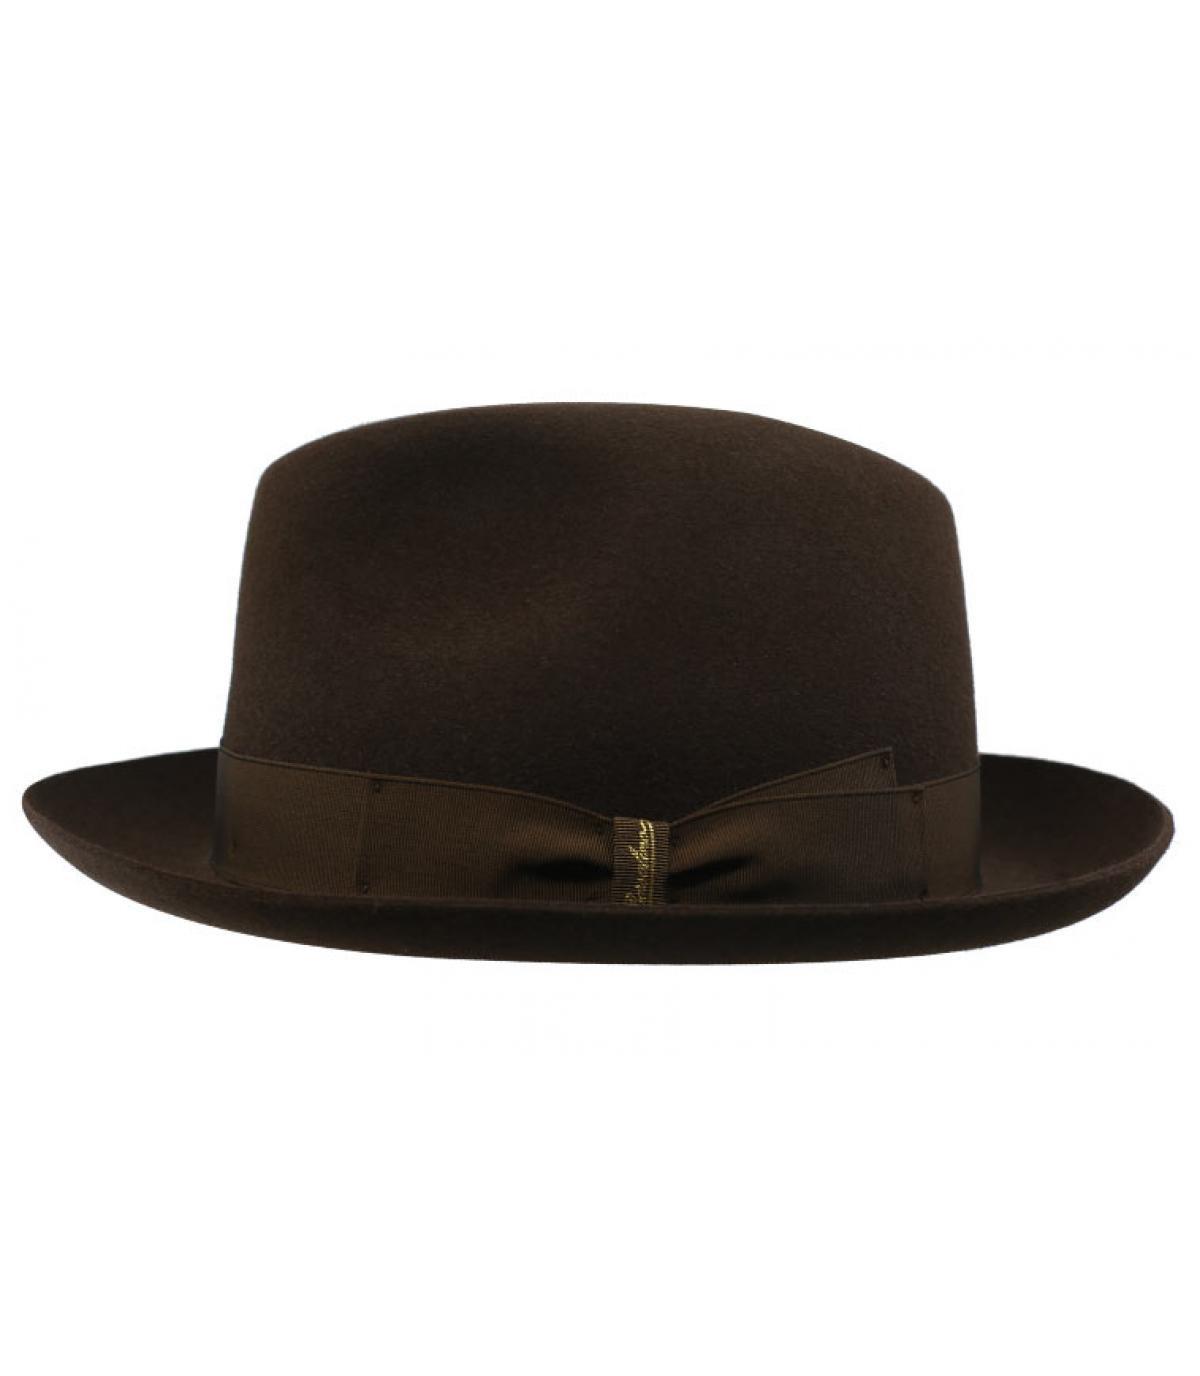 fedora rabbit brown Borsalino - Marengo brown Fur Felt Hat Borsalino -  image 1 ... 456b9704c03